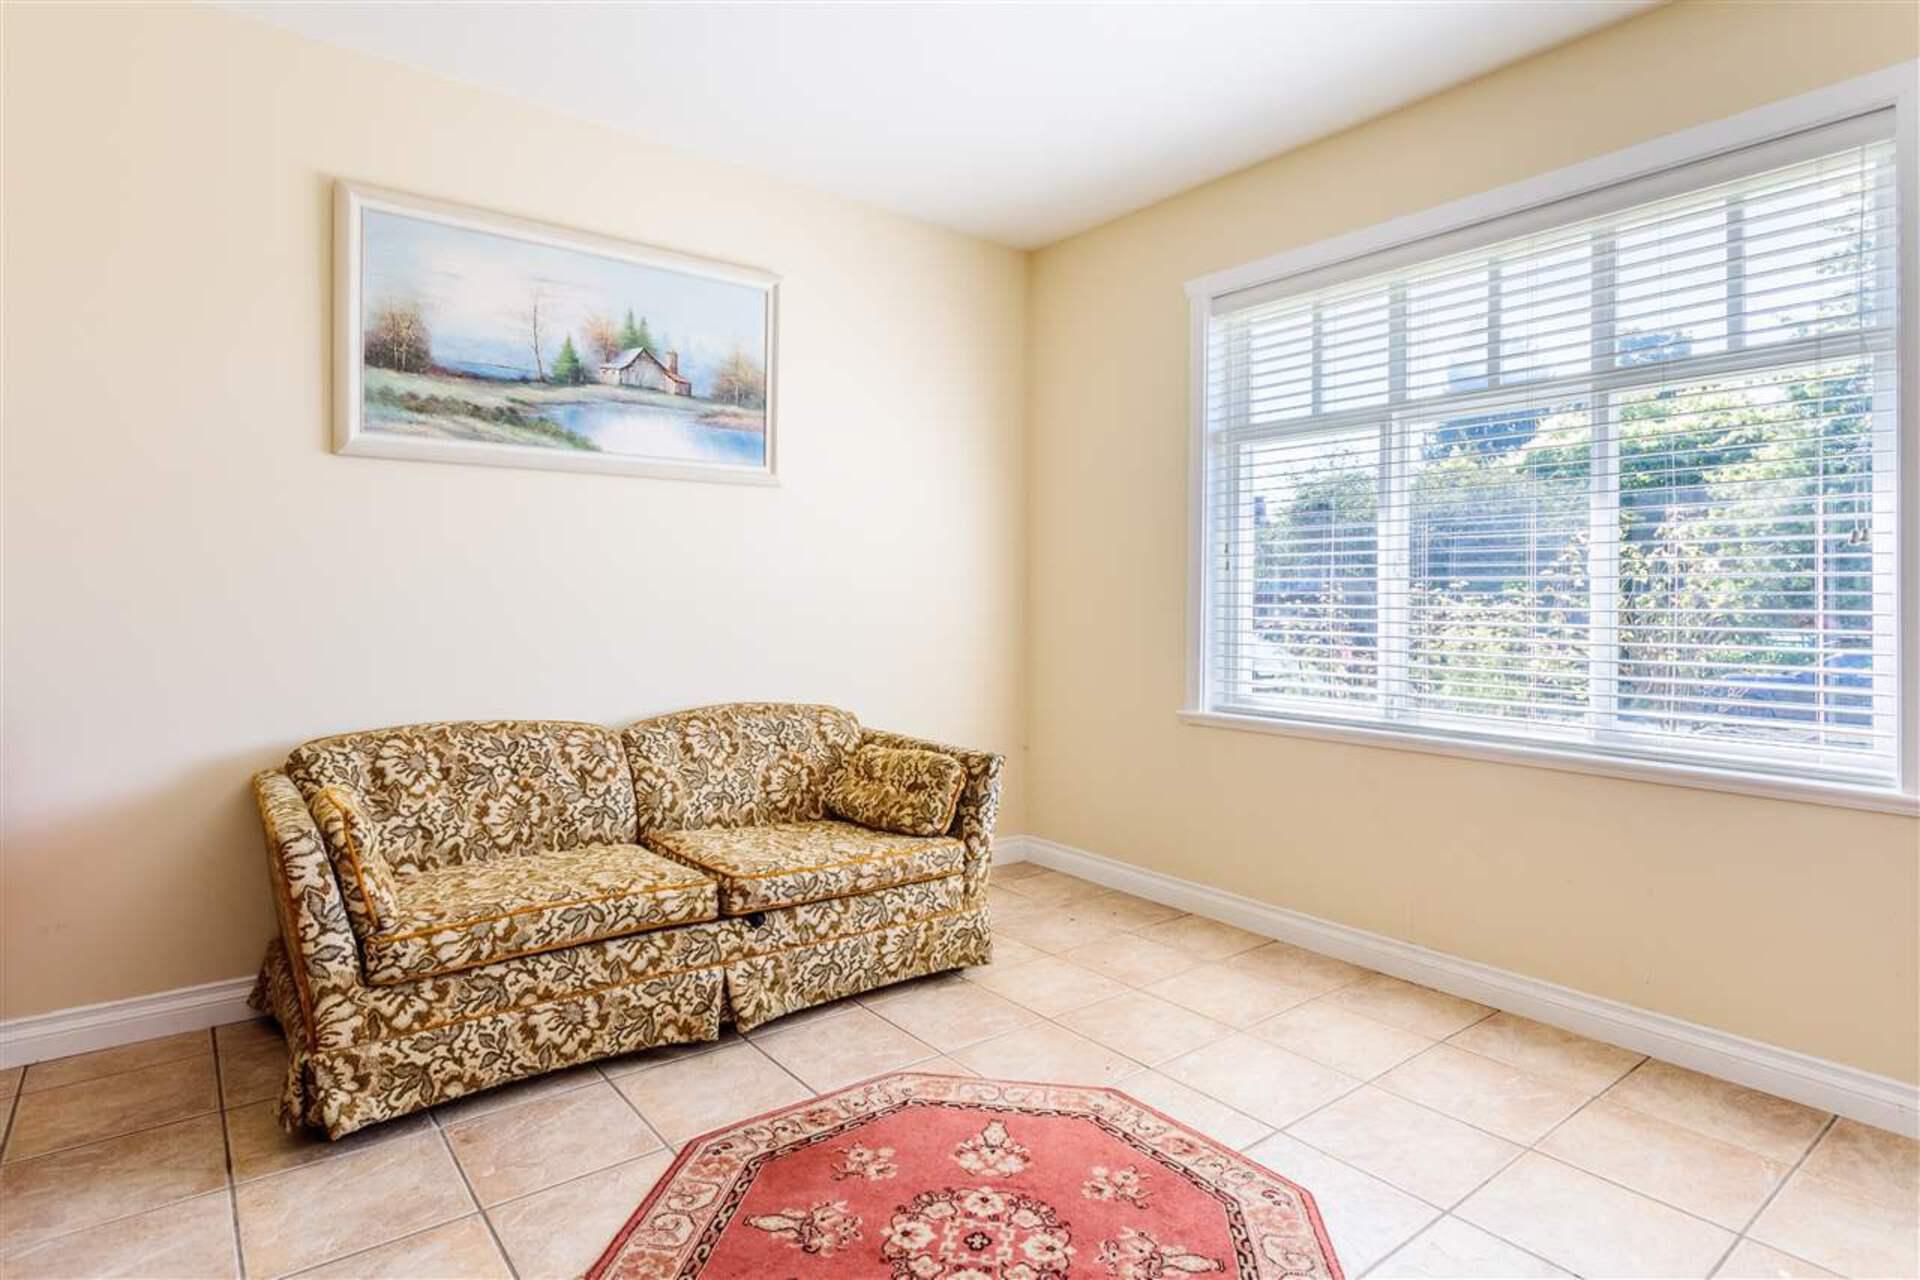 4015-frances-street-willingdon-heights-burnaby-north-14 at 4015 Frances Street, Willingdon Heights, Burnaby North